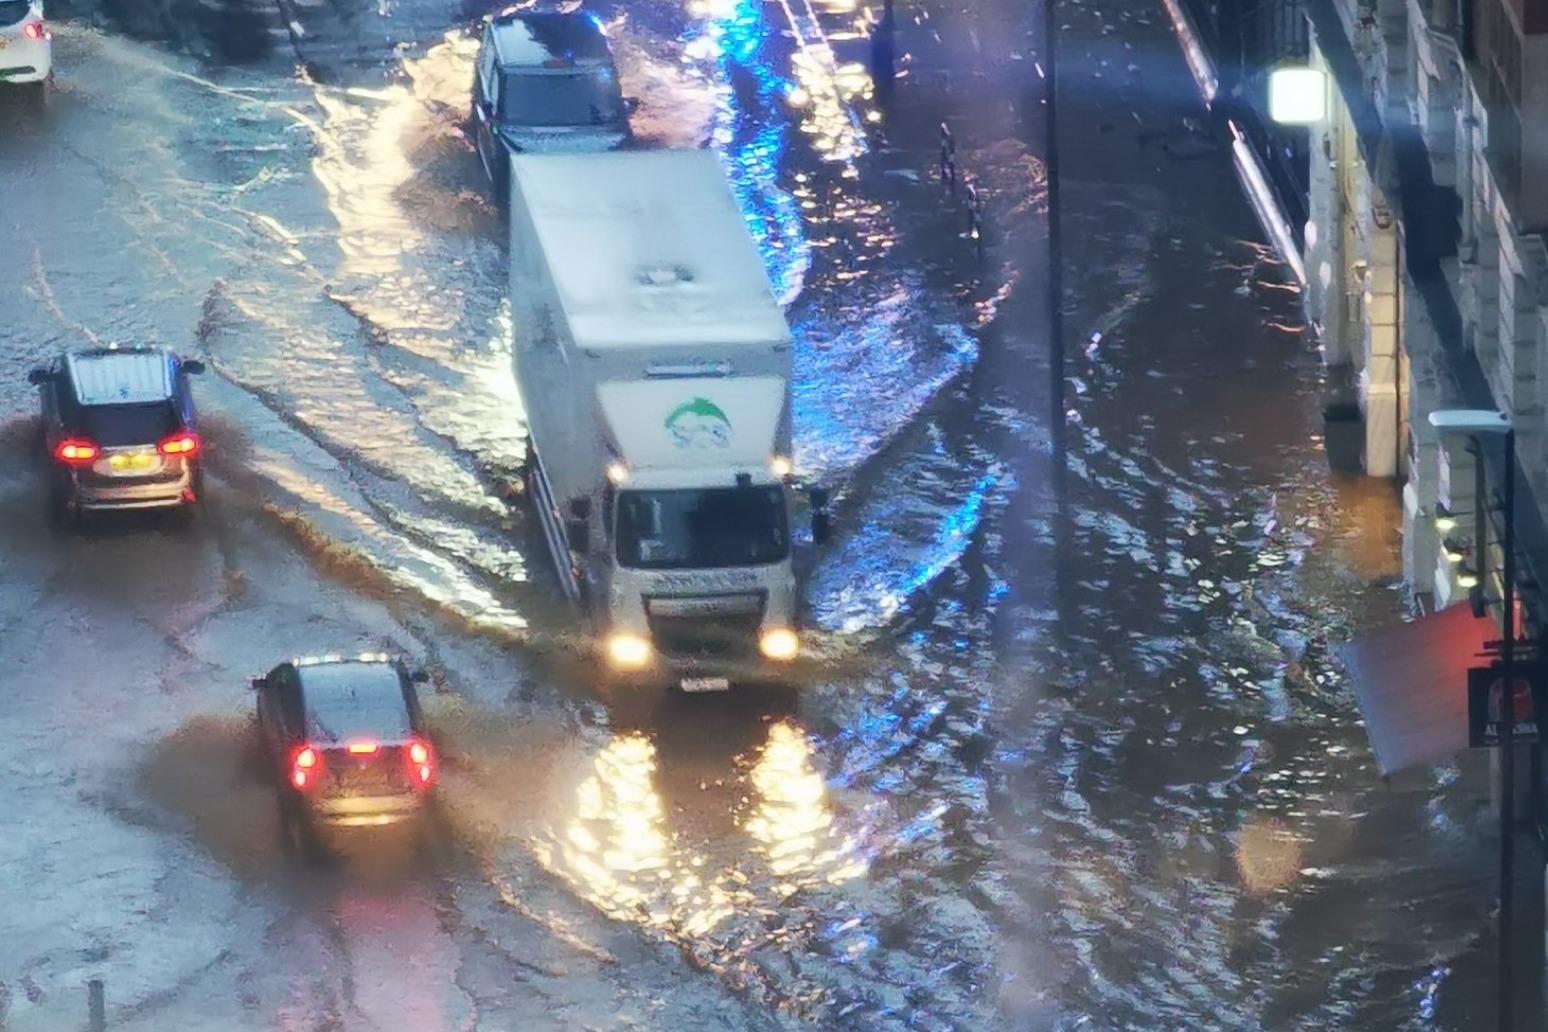 Heavy rain moving northwards following flash floods in London